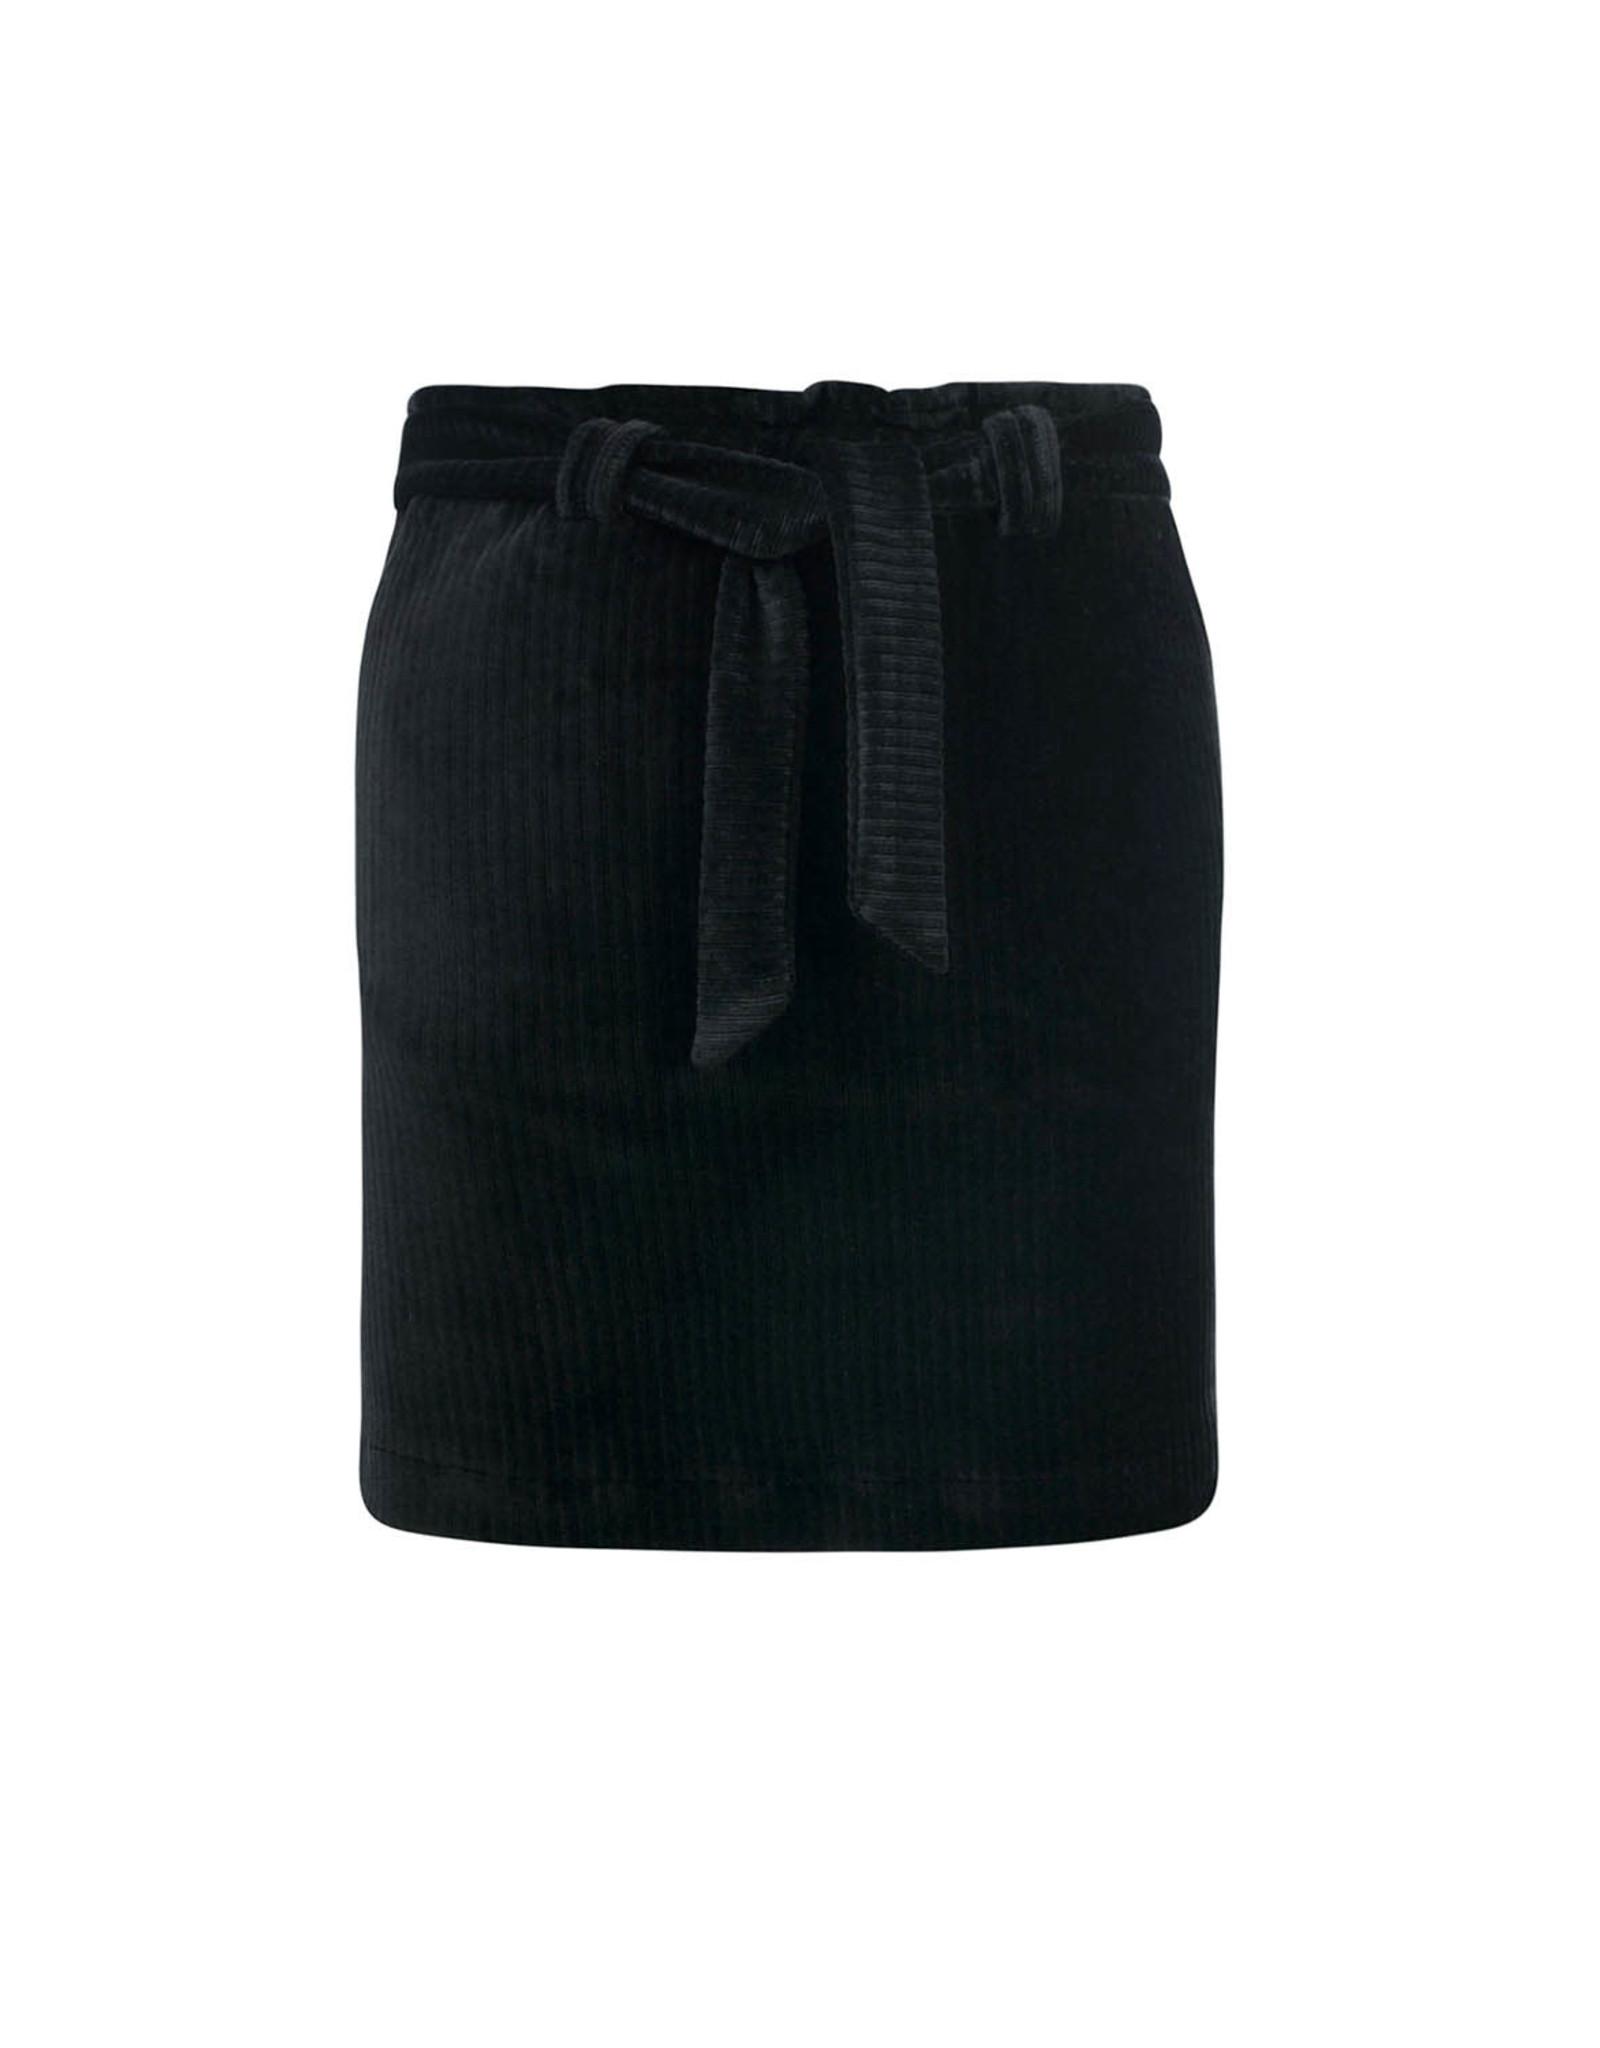 Looxs Girls skirt Black